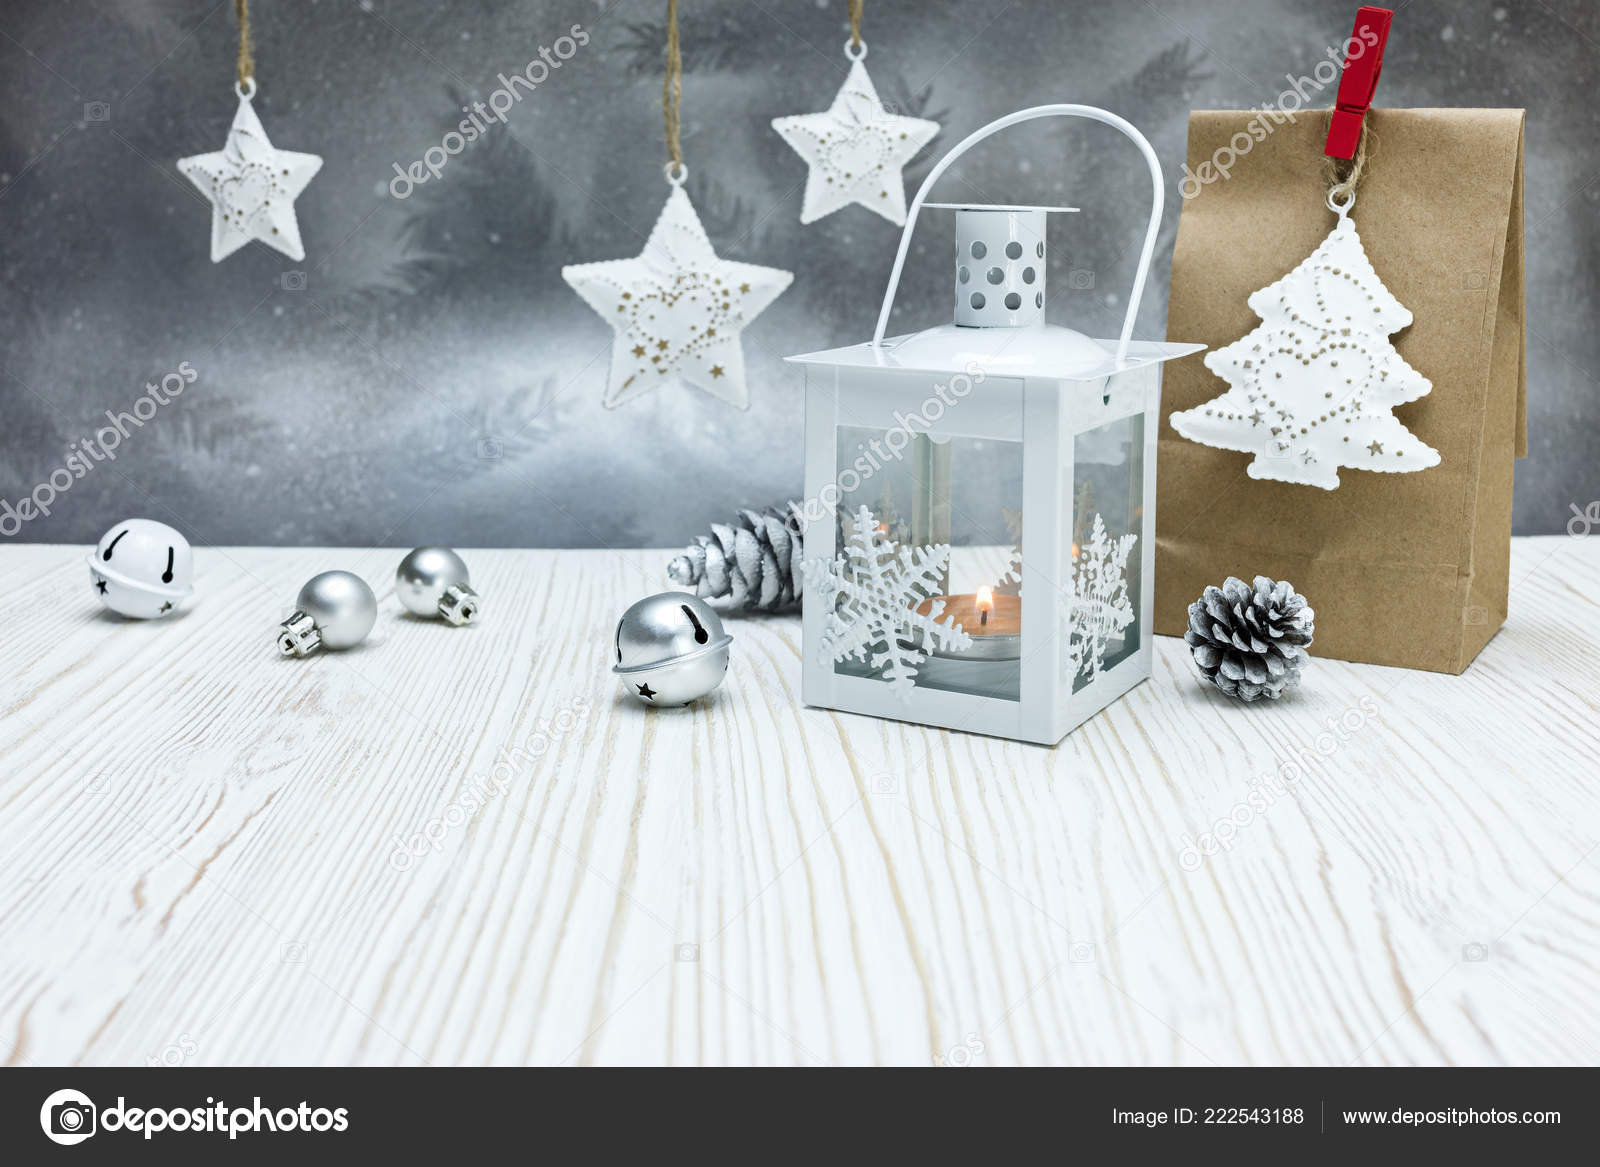 Christmas Tree Decorations Handmade Paper Present Bag